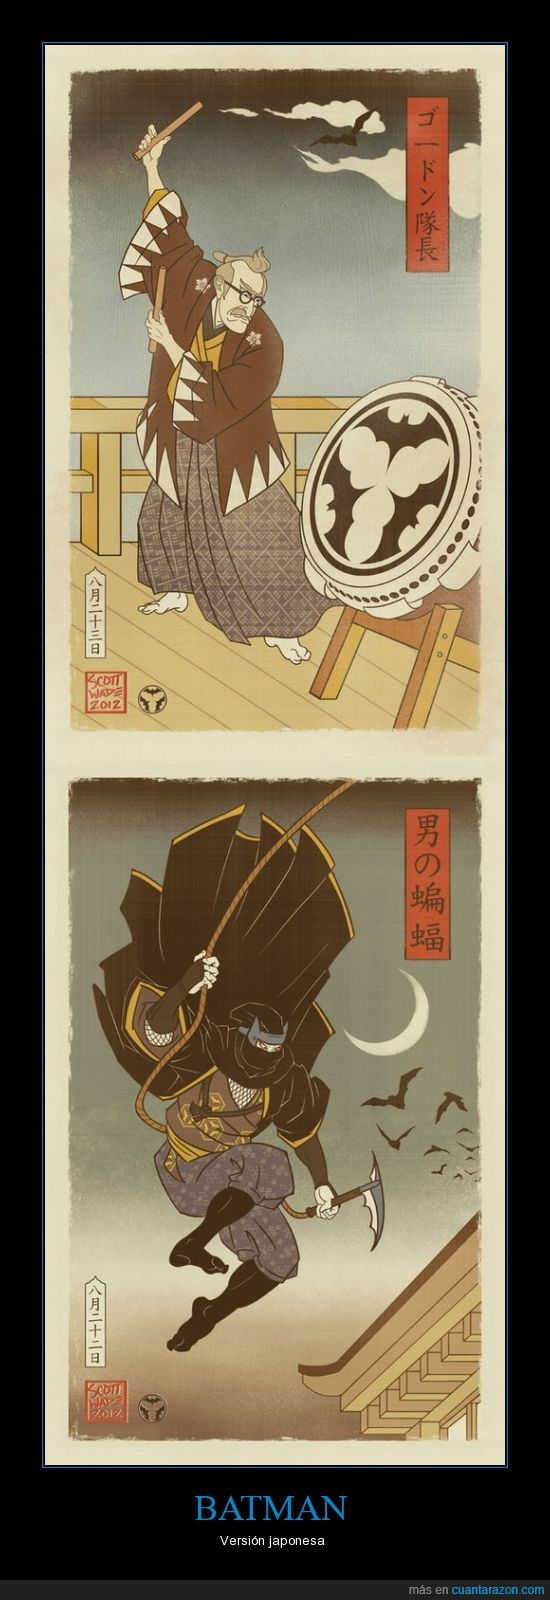 batman,caballero,japo,japones,japonesa,oscuro